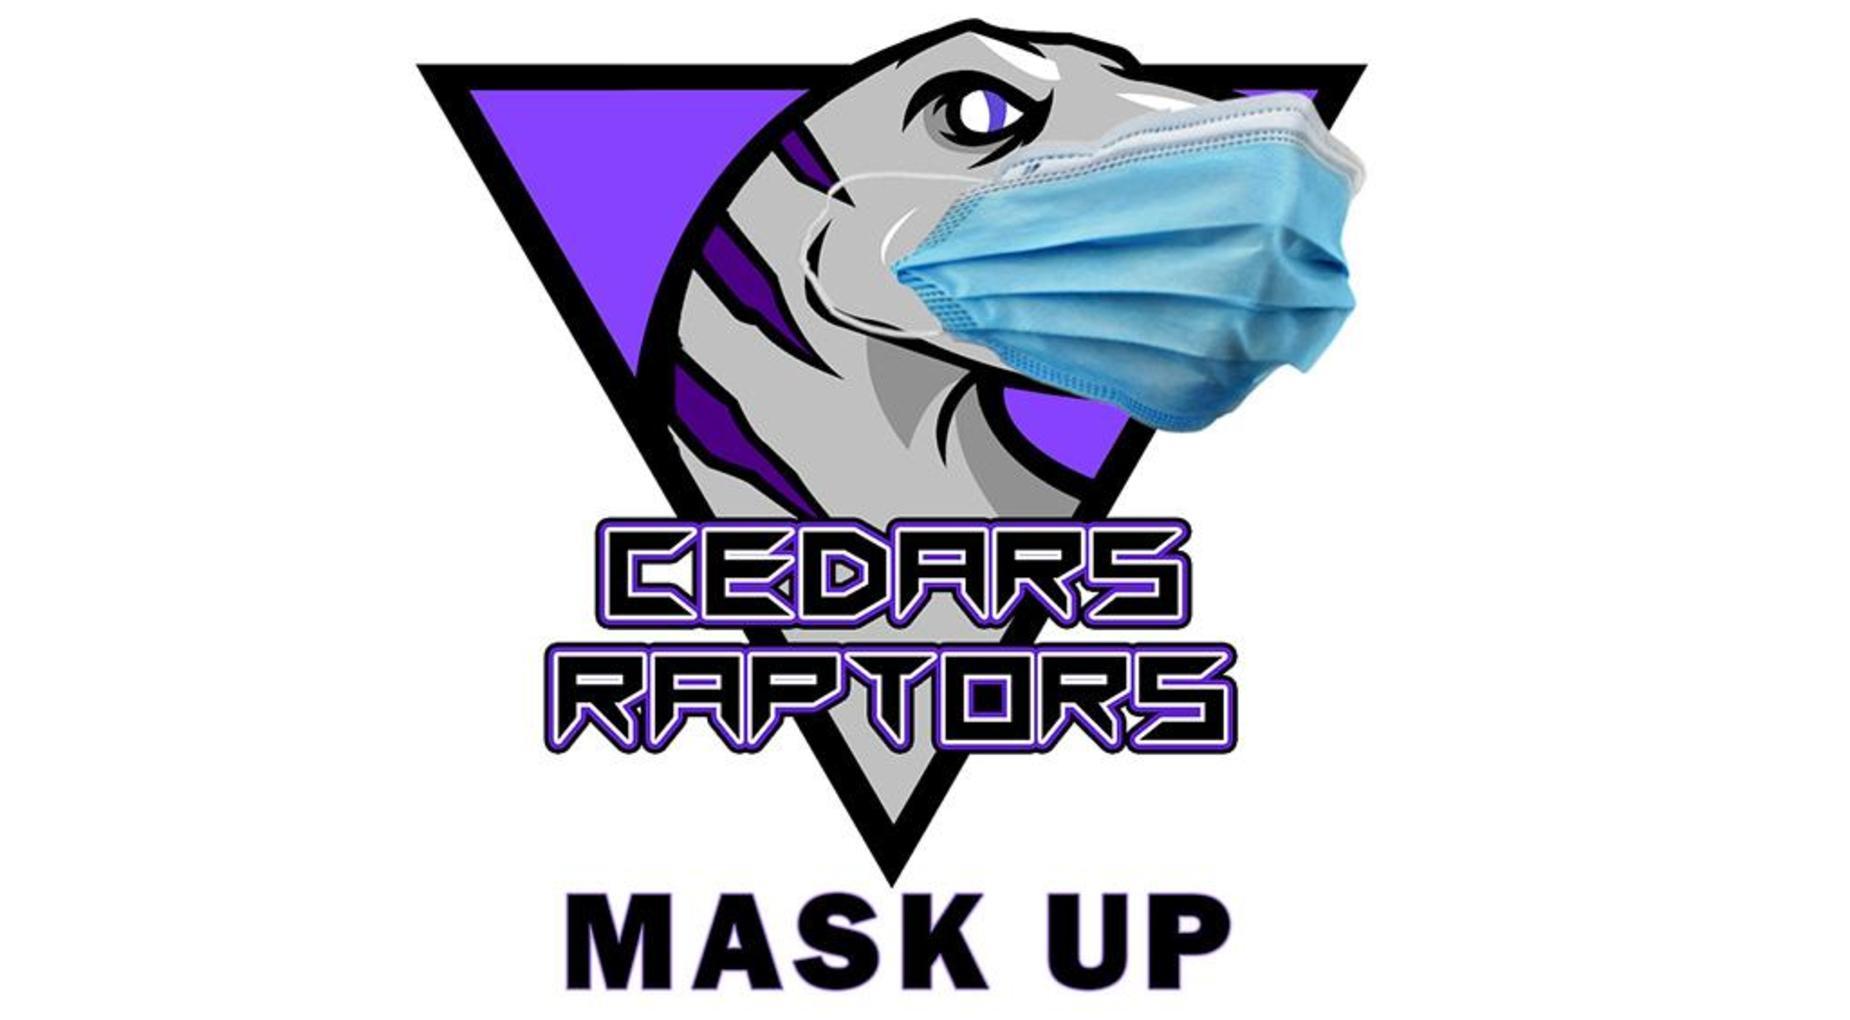 Mask Up Cedars